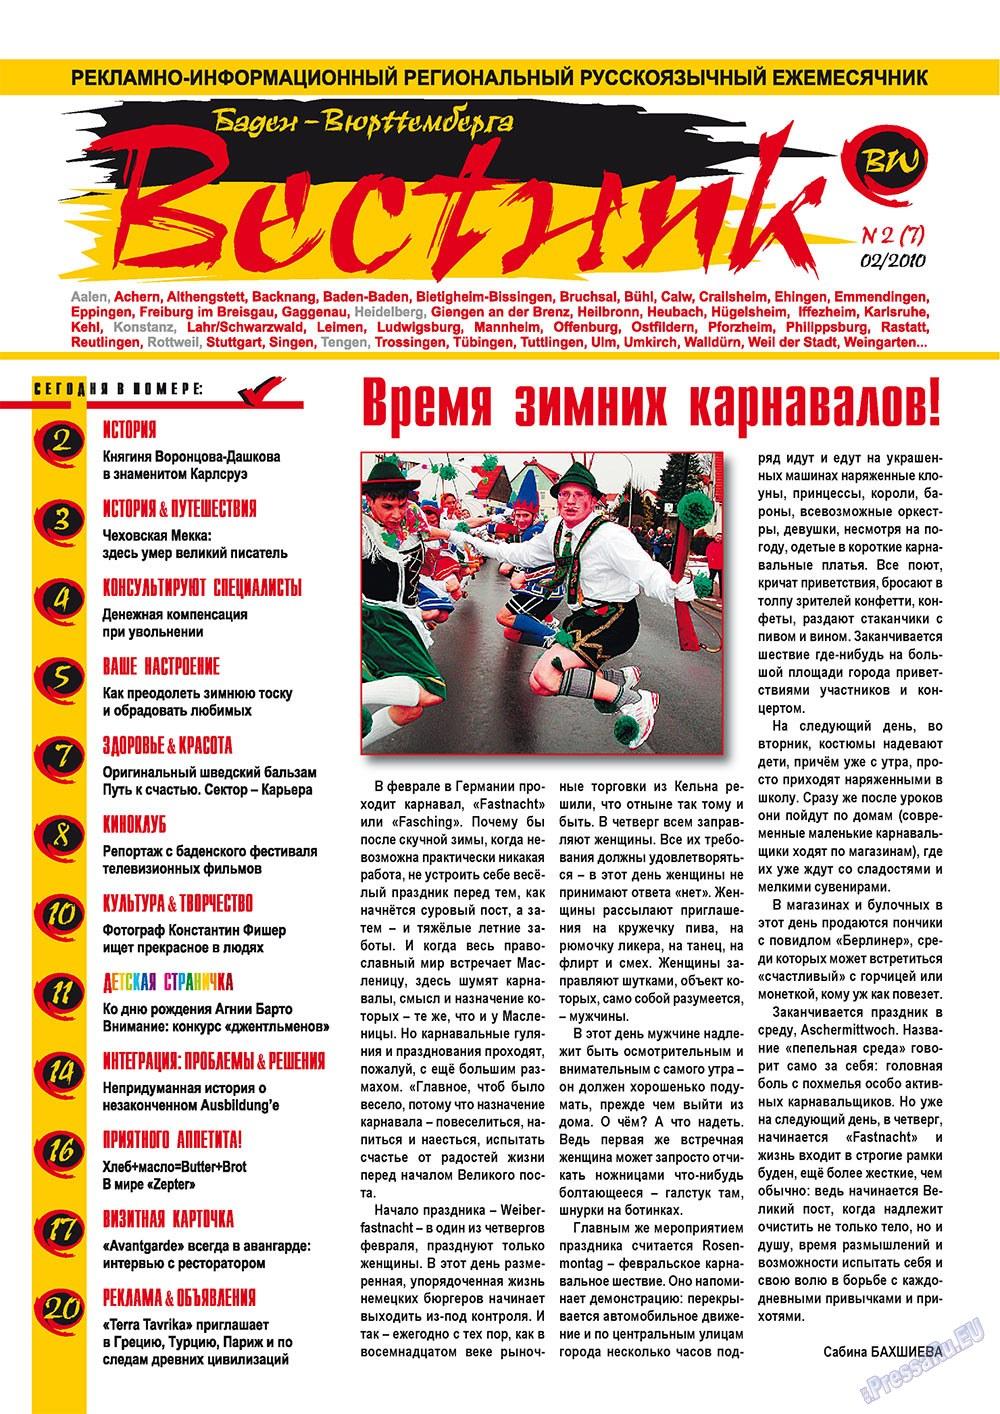 Вестник-info (журнал). 2010 год, номер 2, стр. 1